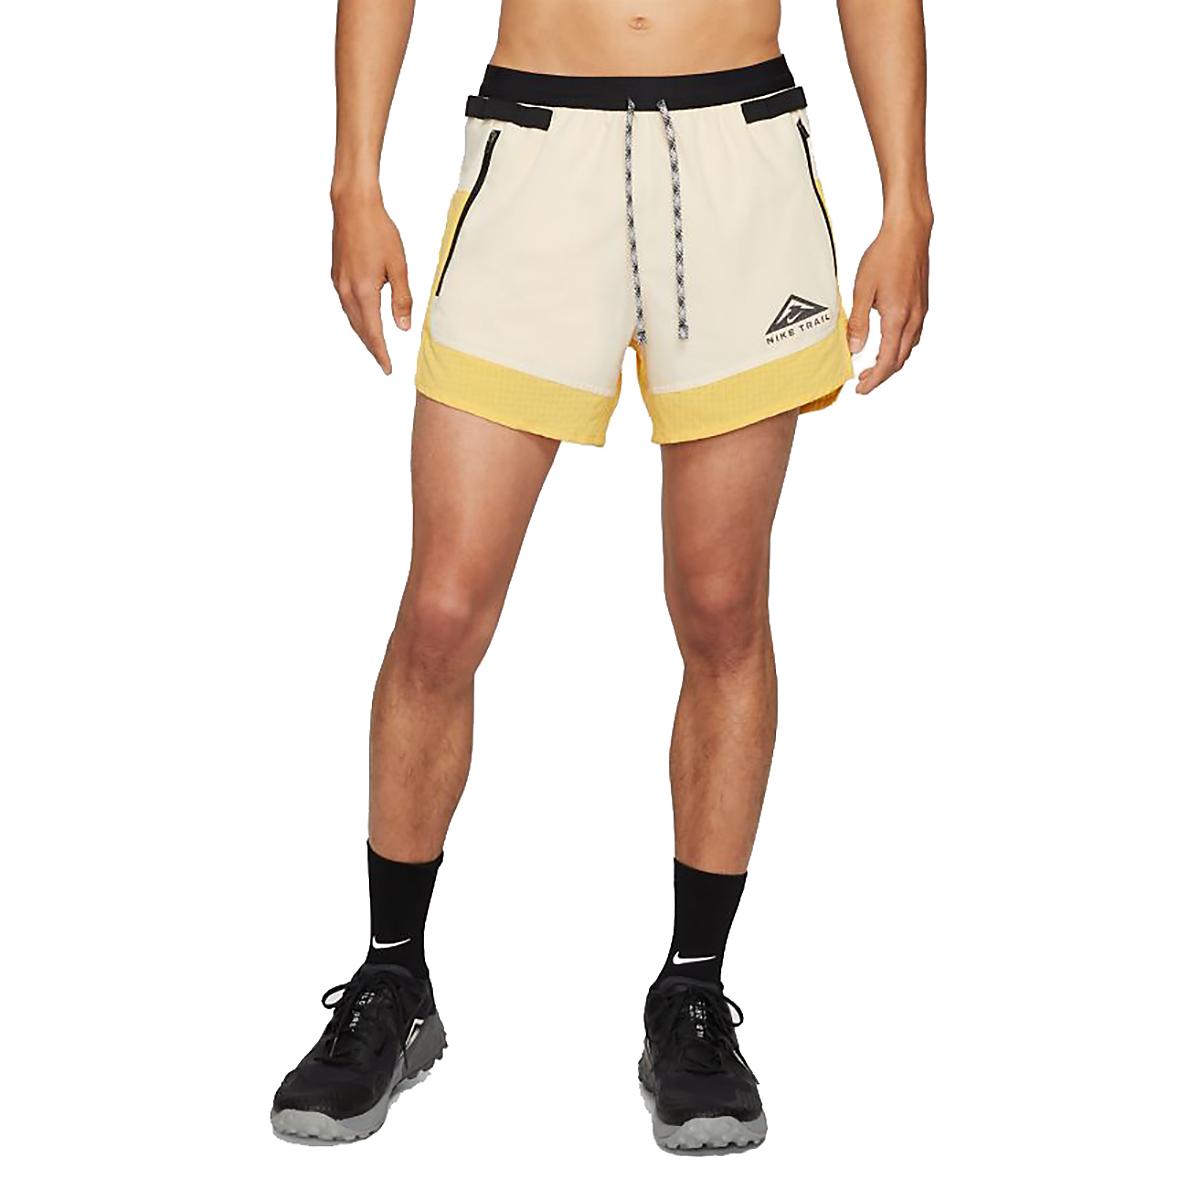 Men's Nike Dri-FIT Flex Stride Trail Shorts - Color: Solar Flare/Beach/Black - Size: S, Solar Flare/Beach/Black, large, image 1